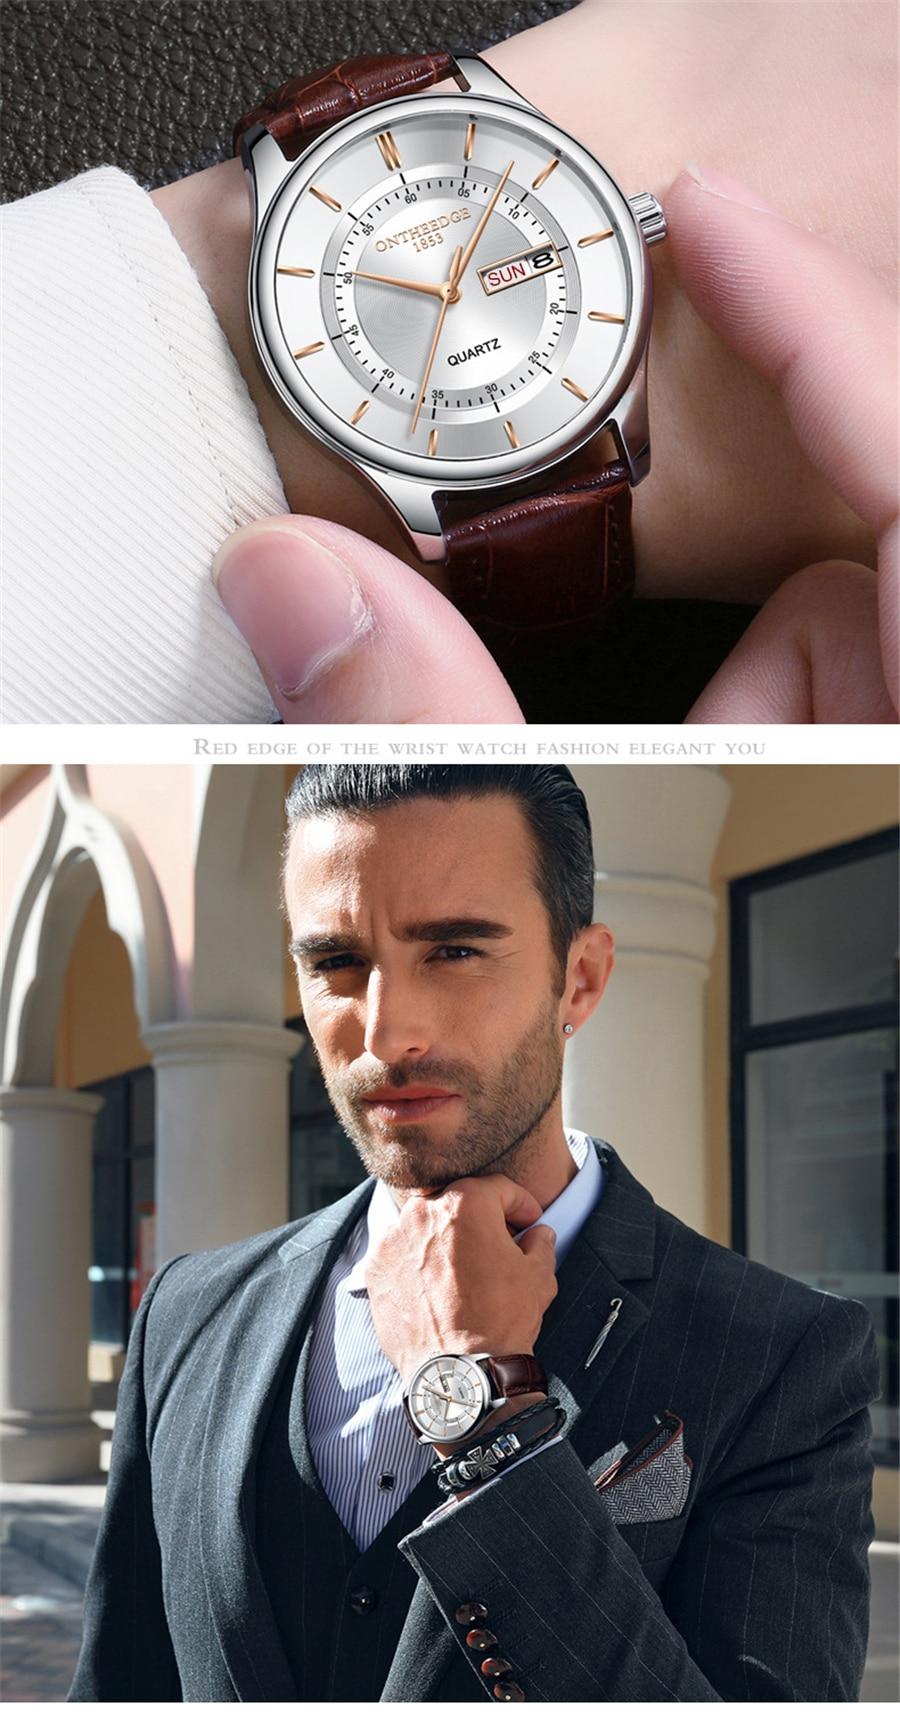 HTB1VAI.iFGWBuNjy0Fbq6z4sXXaD High Quality Rose Gold Dial Watch Men Leather Waterproof 30M Watches Business Fashion Japan Quartz Movement Auto Date Male Clock